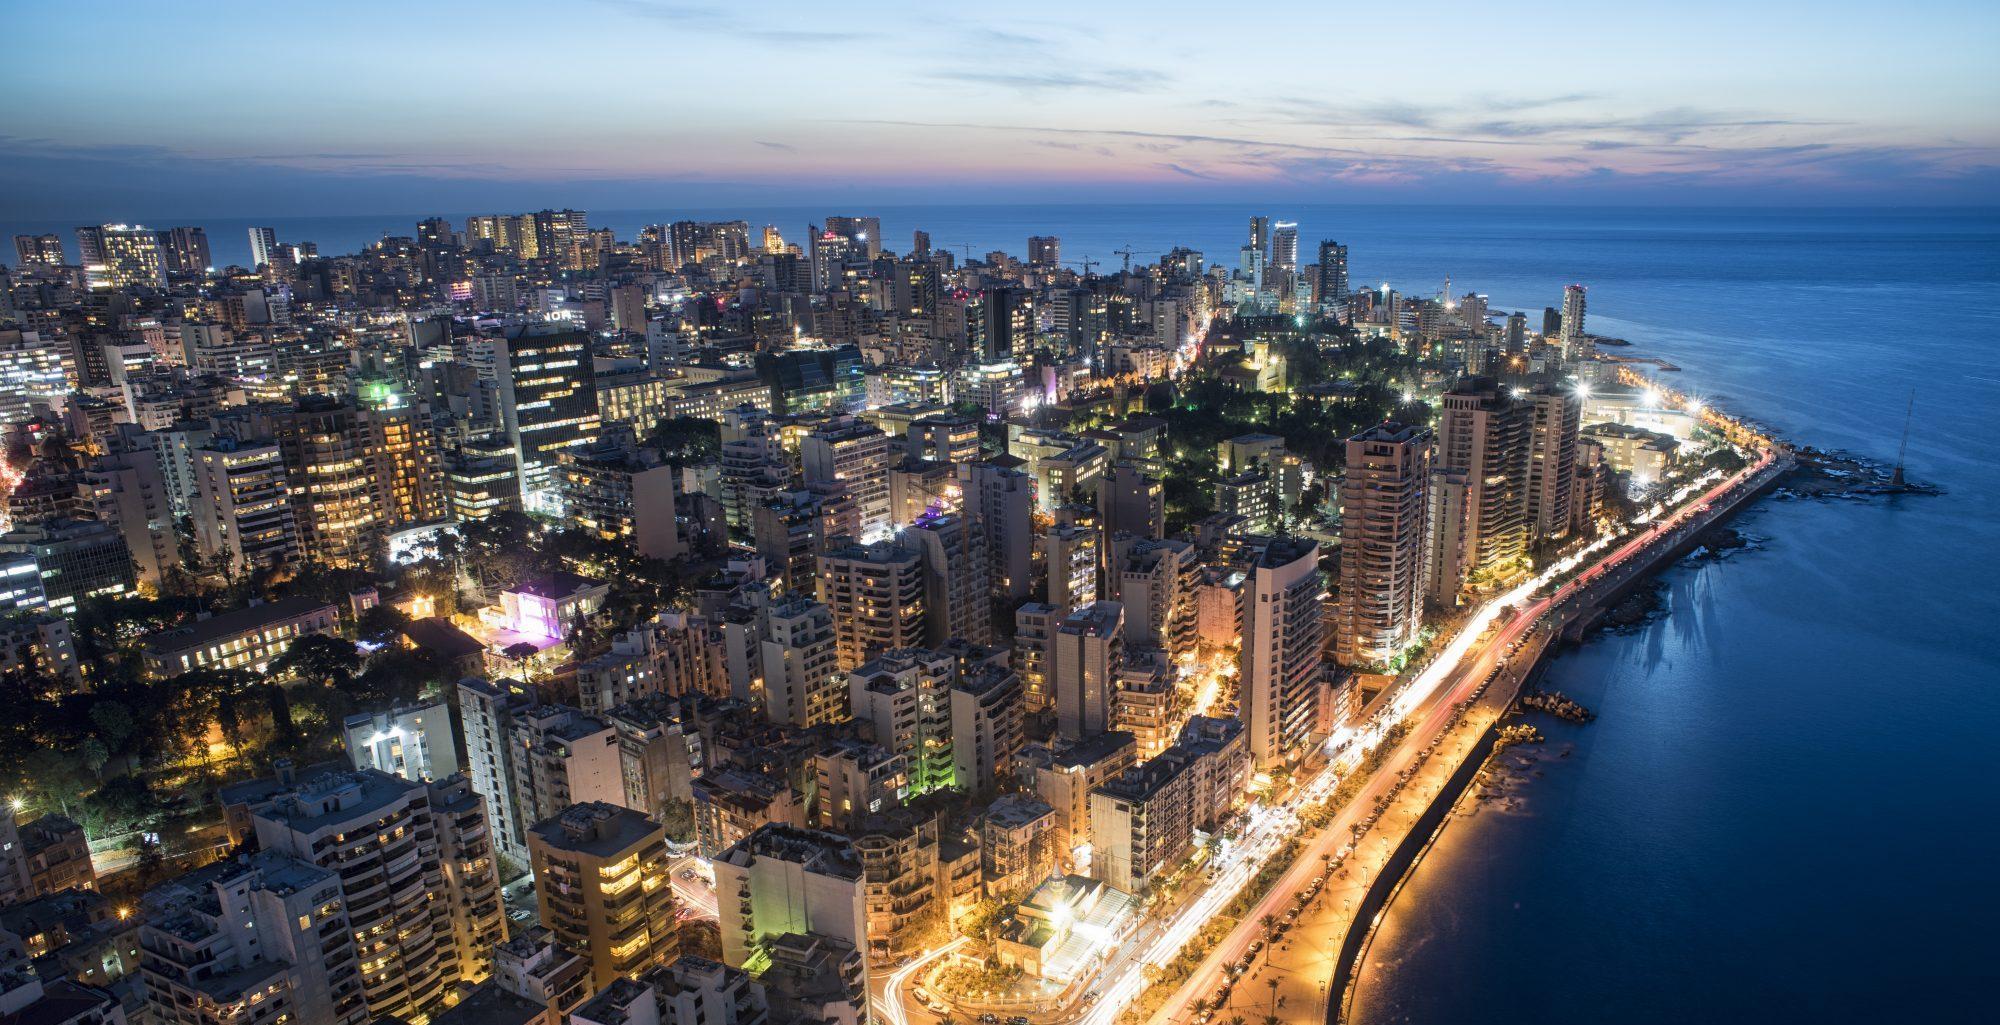 Beirut, Lebanon 2018 GBA Summit